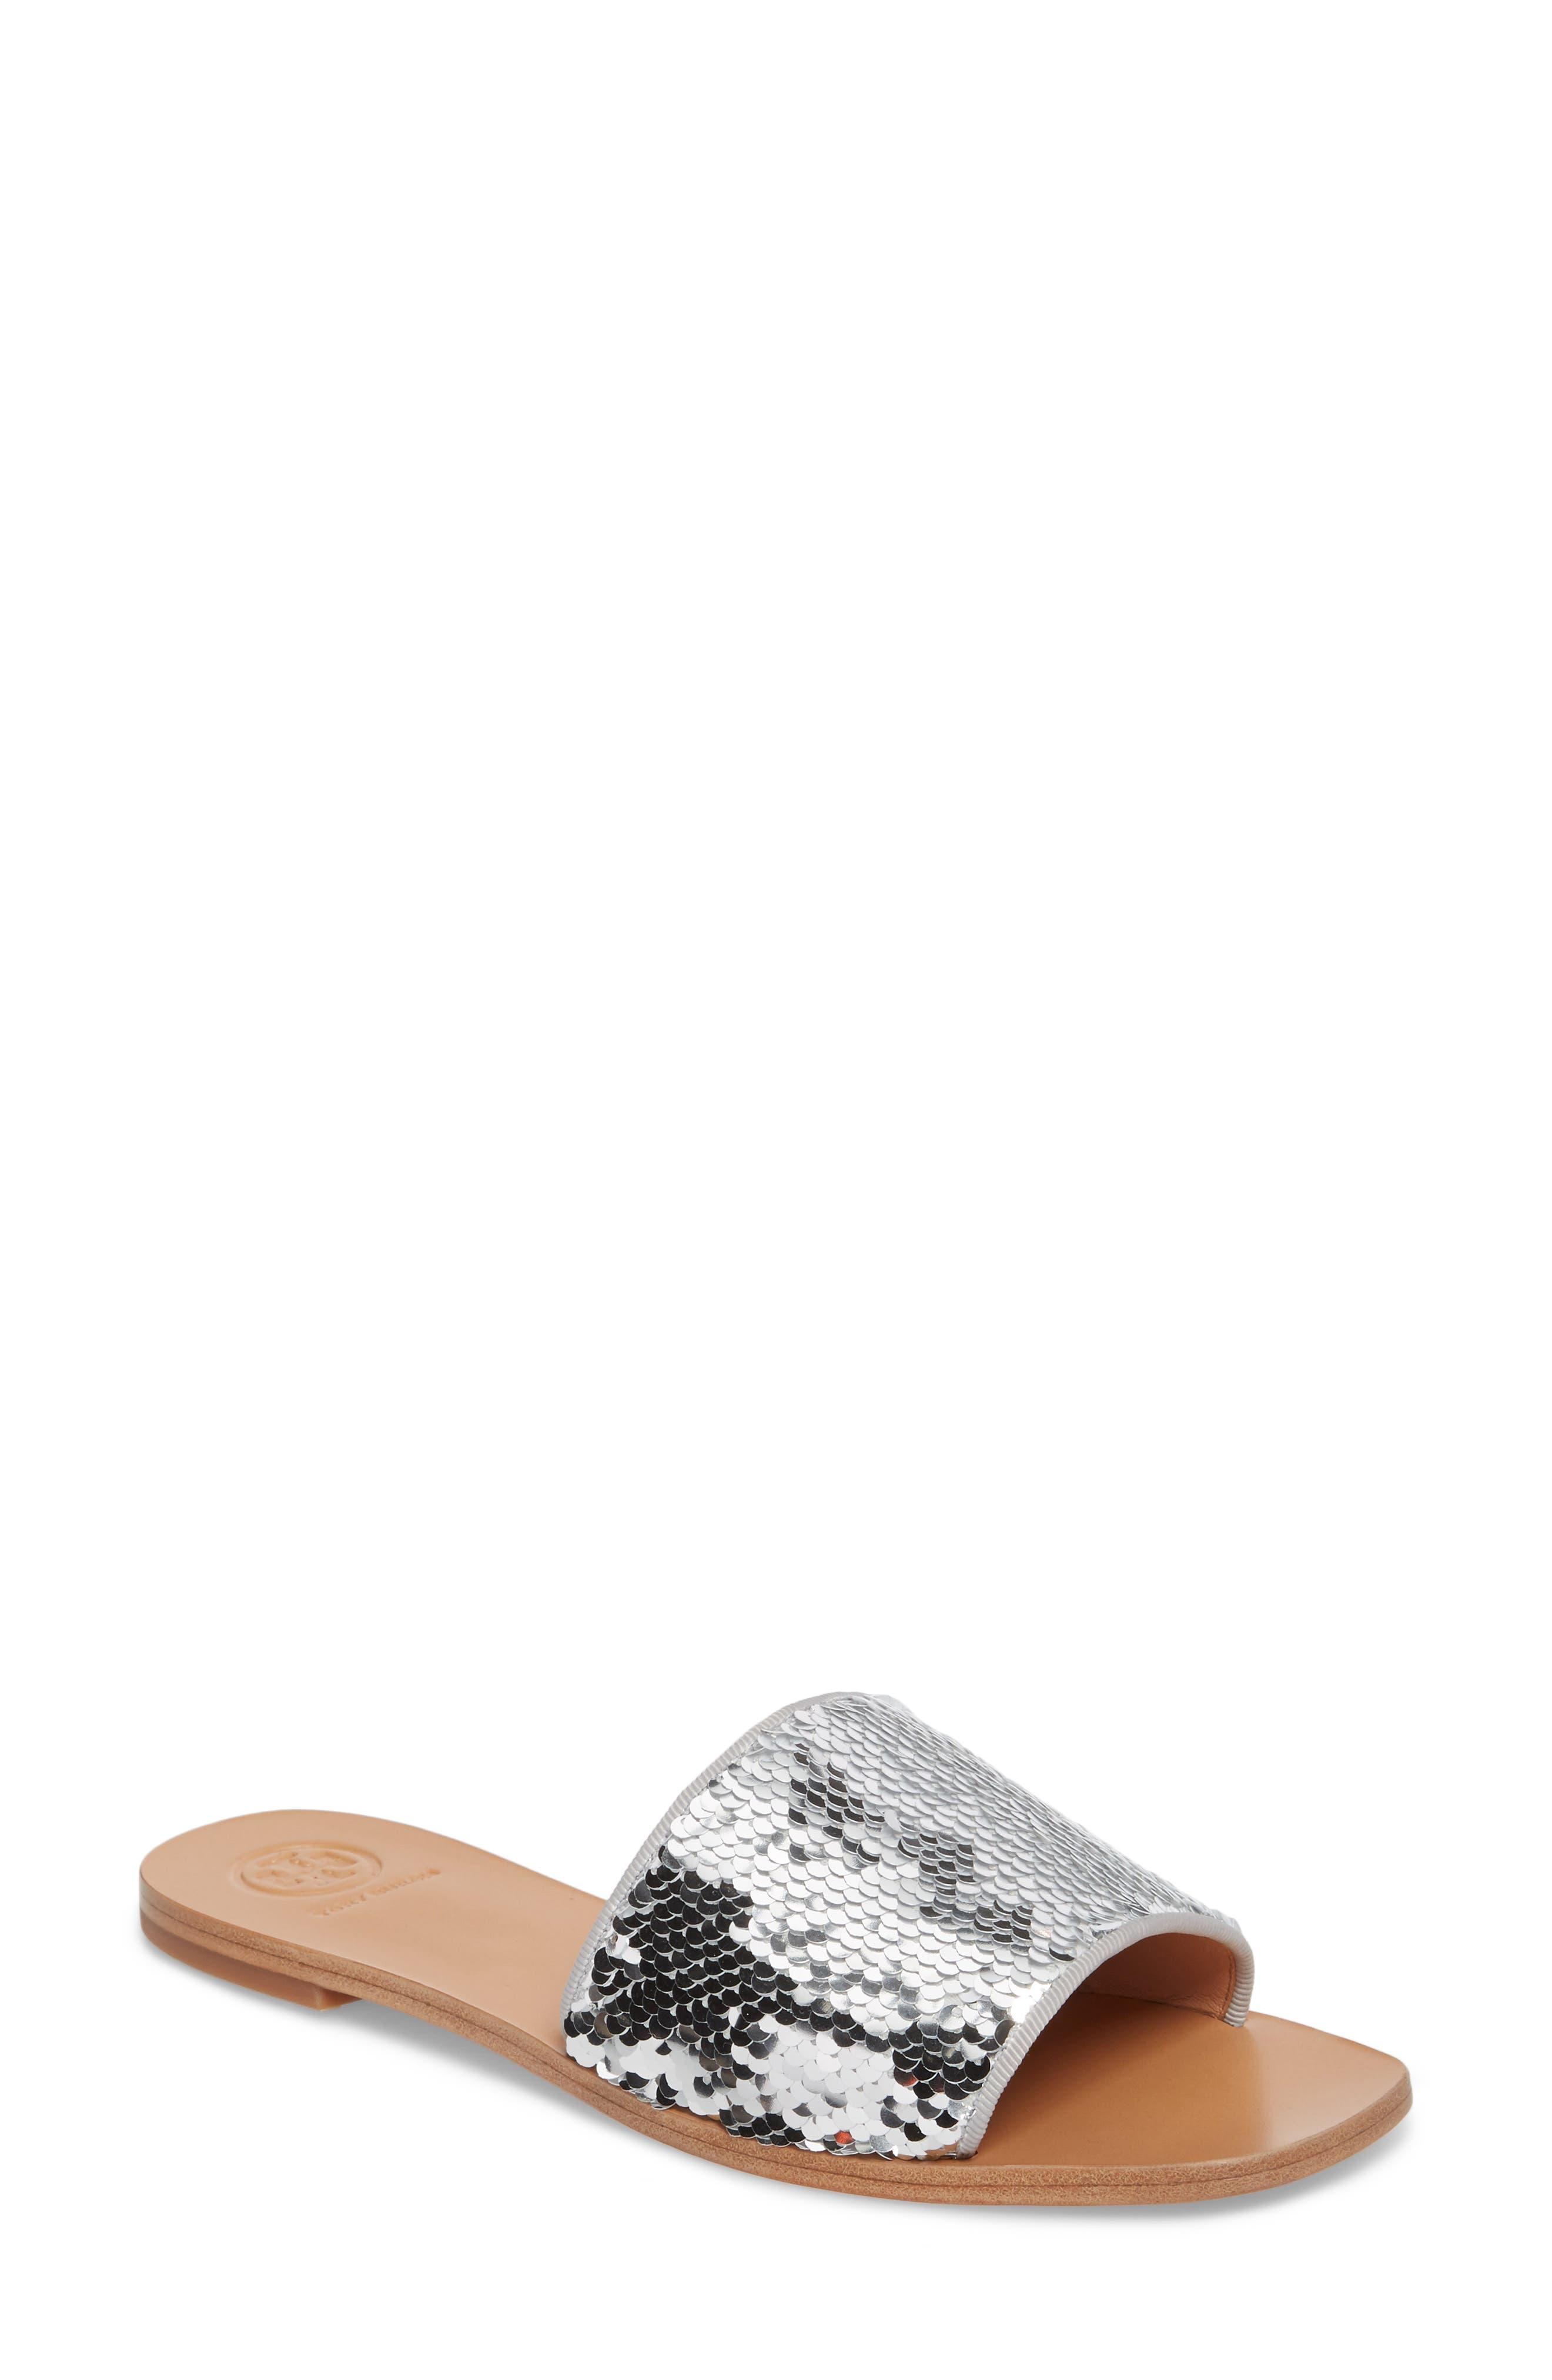 Carter Sequin Slide Sandal,                         Main,                         color, Silver/ Perfect White